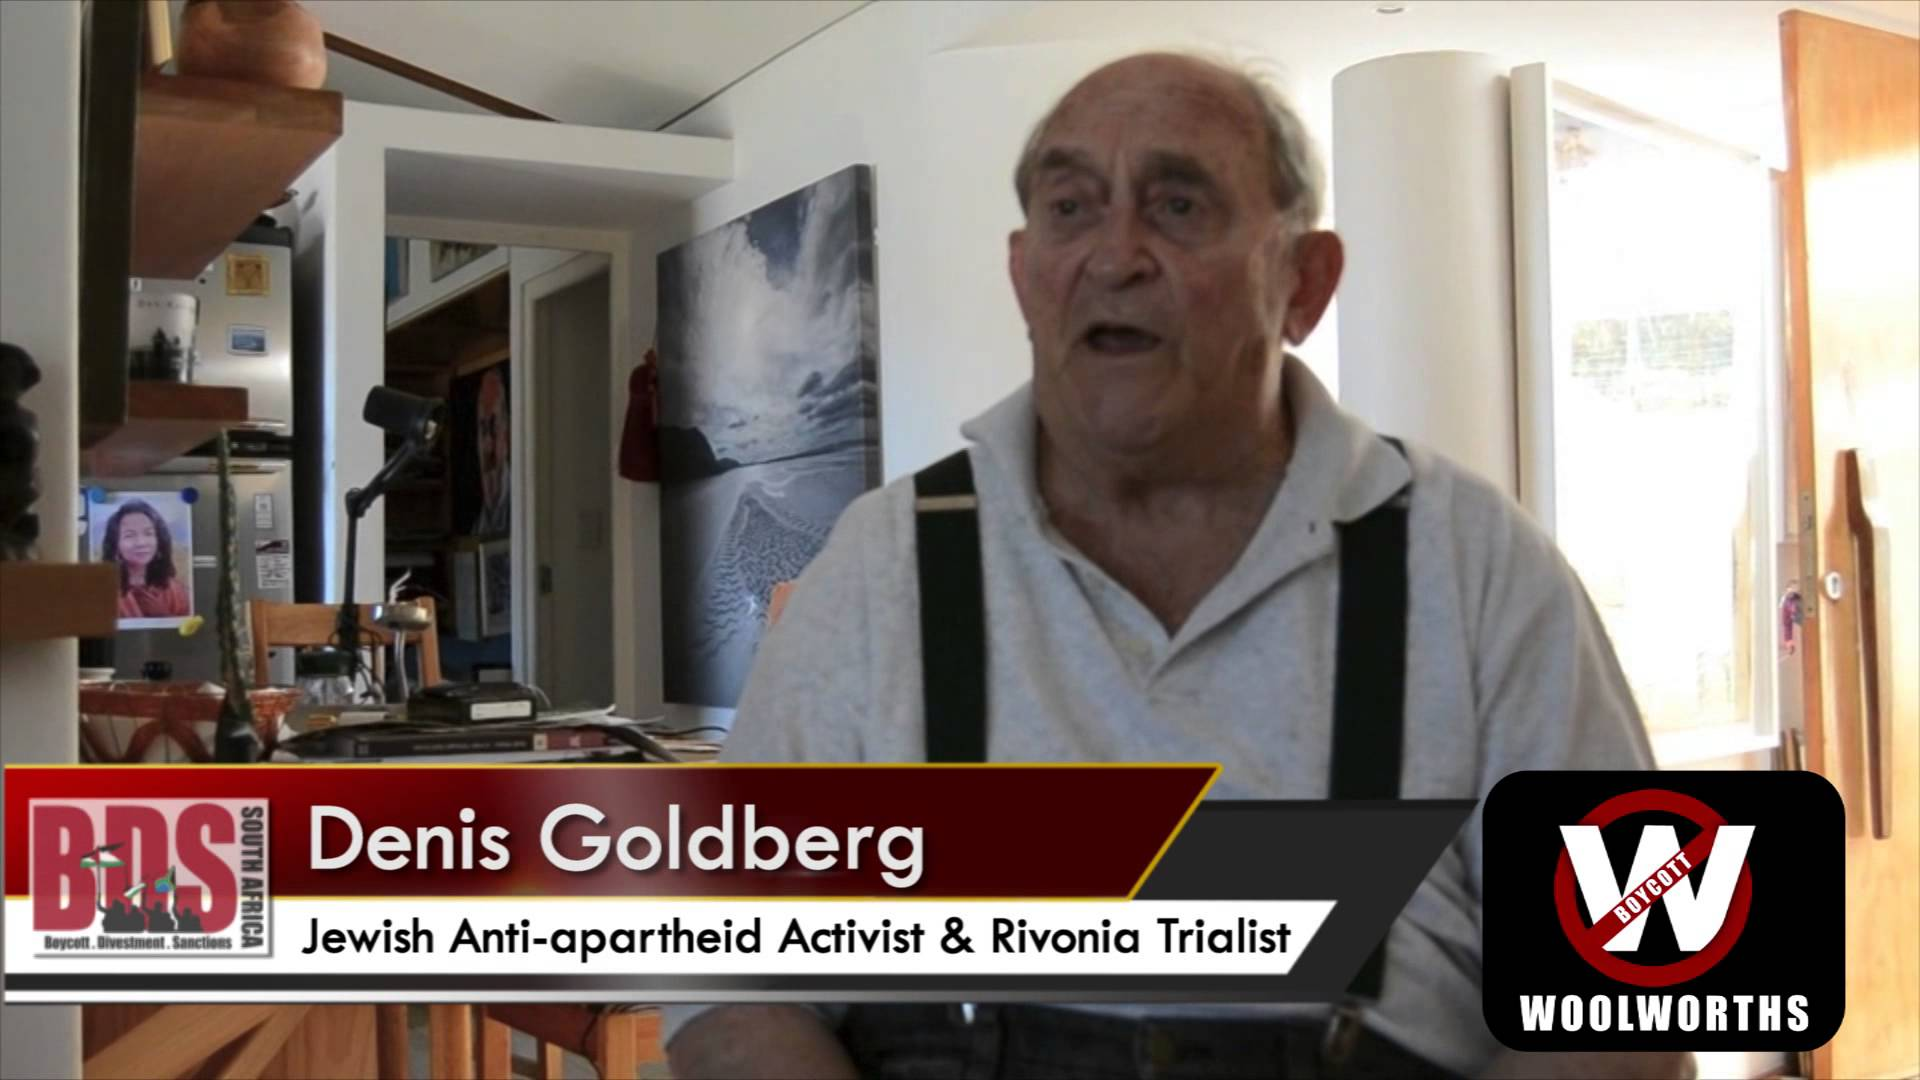 BDS Press Release: Nelson Mandela's co-accused, Denis Goldberg, slams Israeli propaganda holiday trips